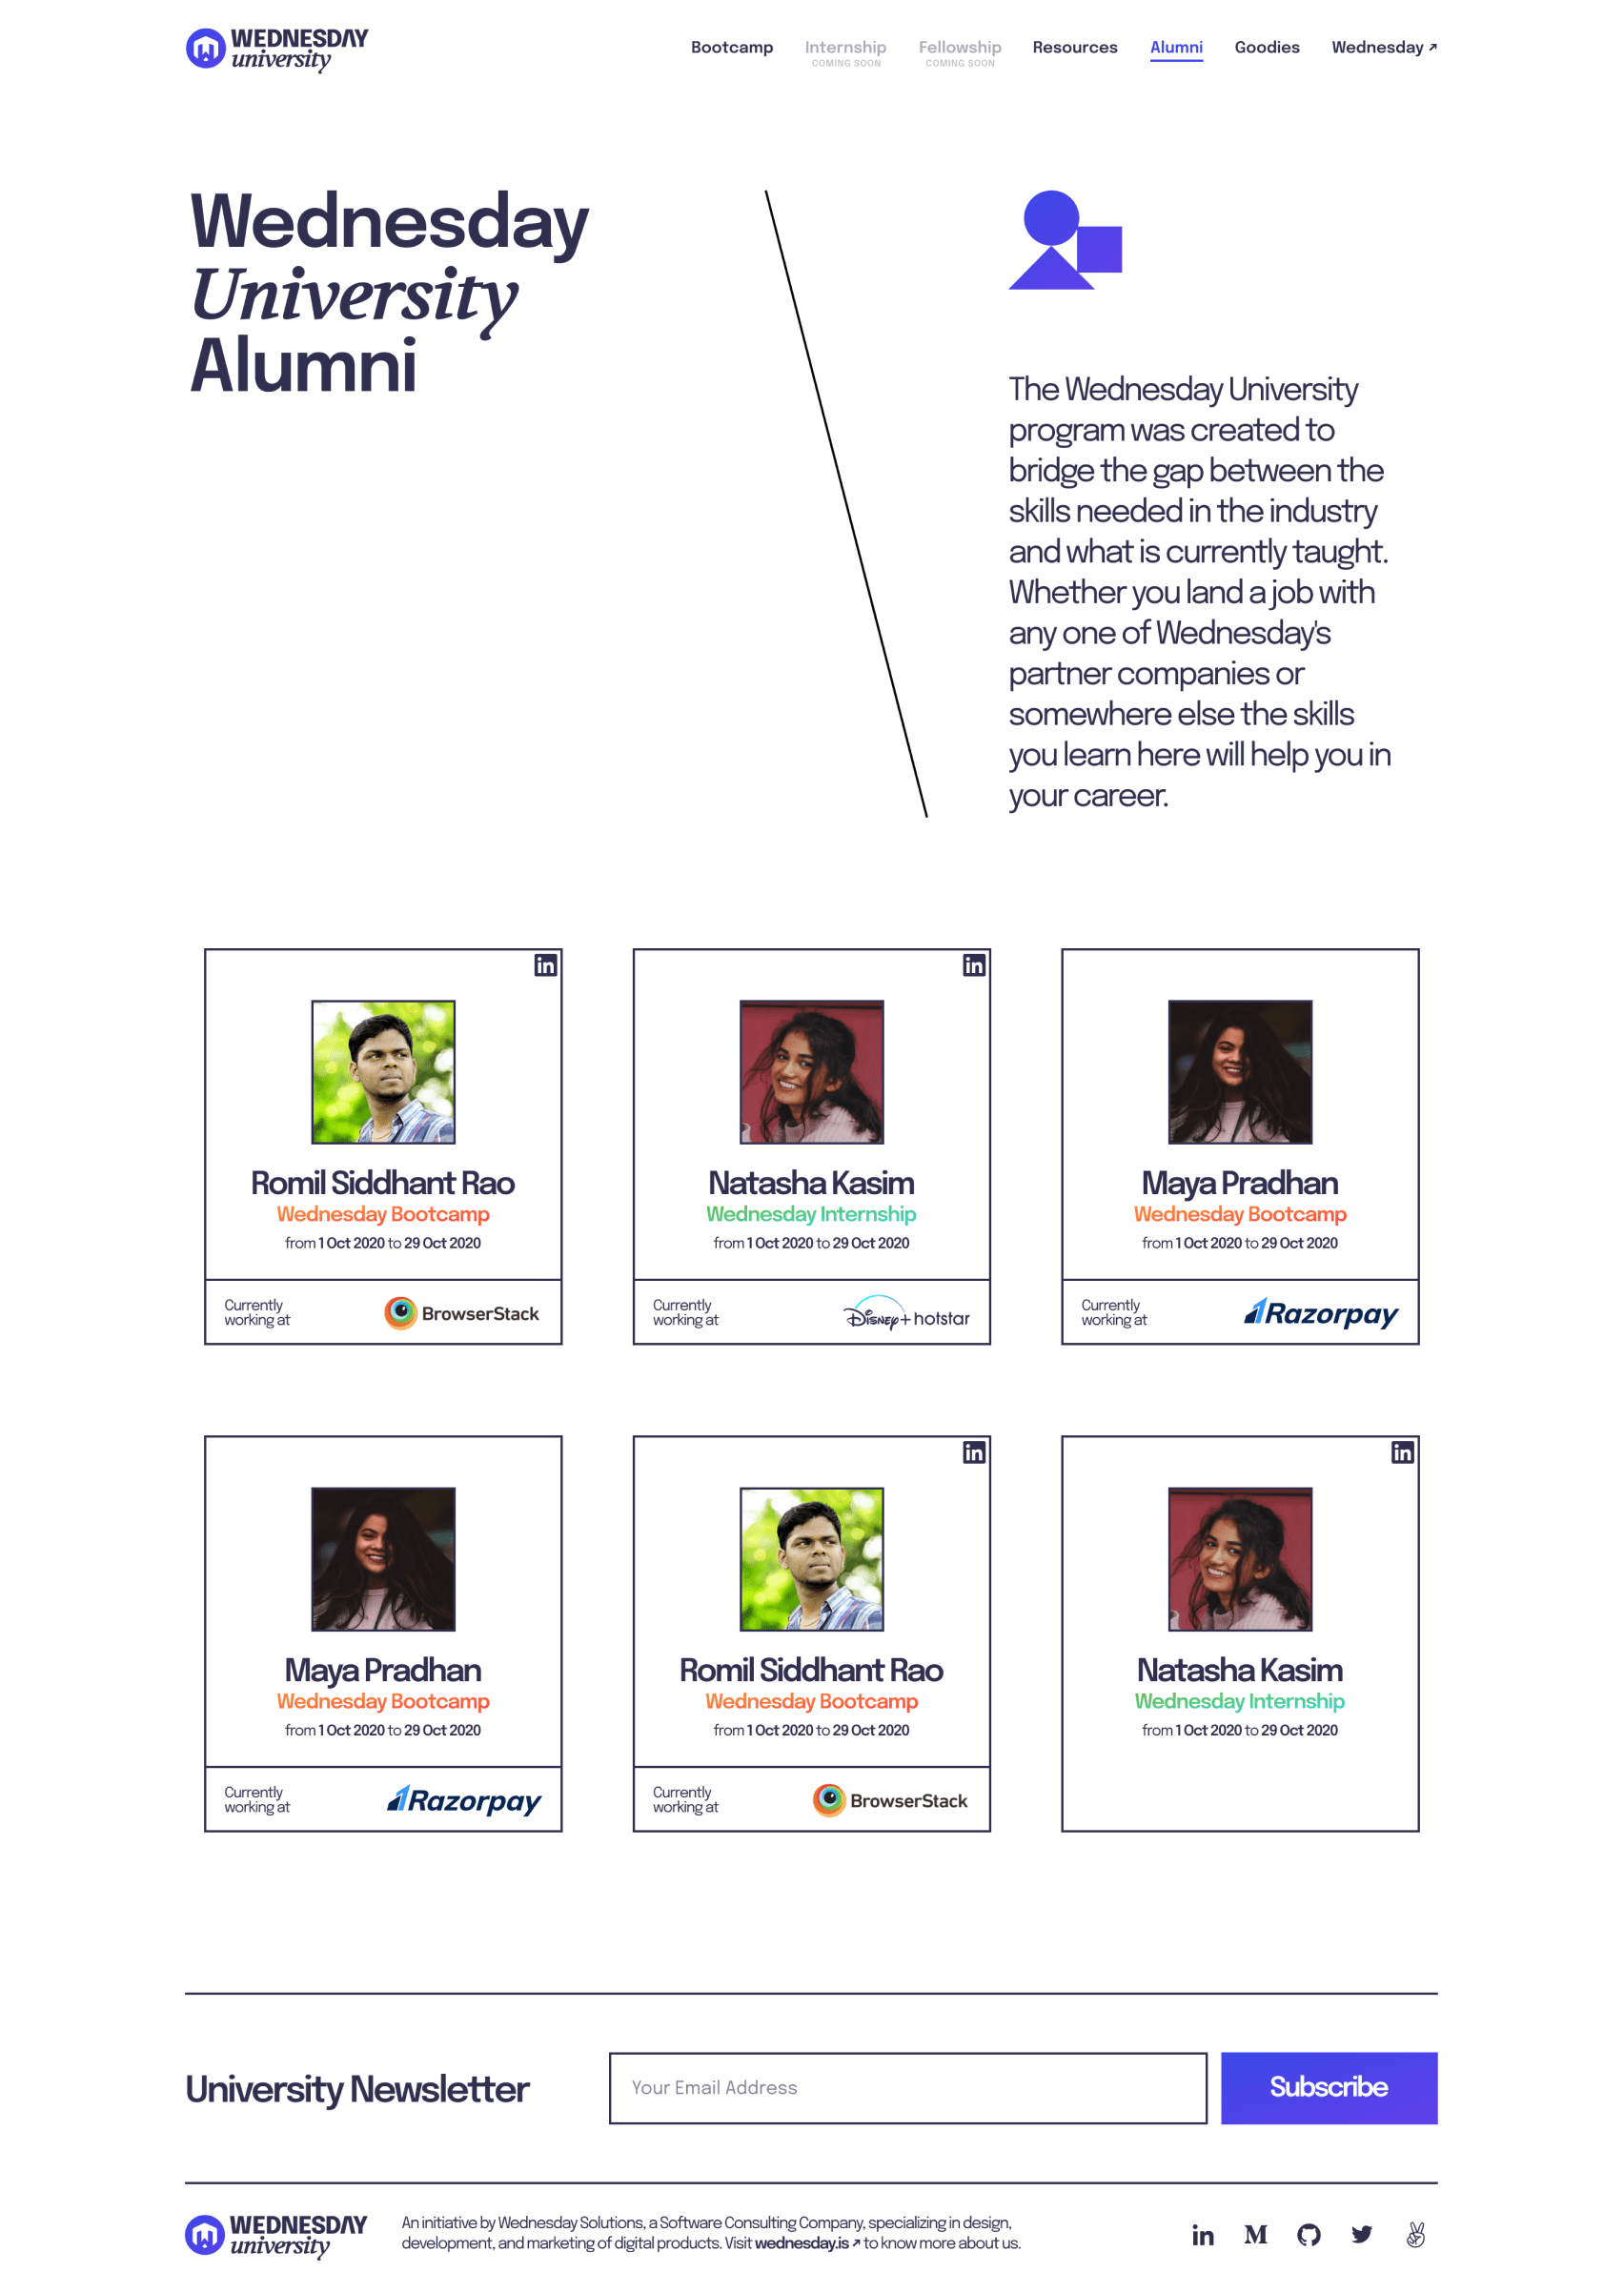 Desktop design that celebrates the alumni of Wednesday University